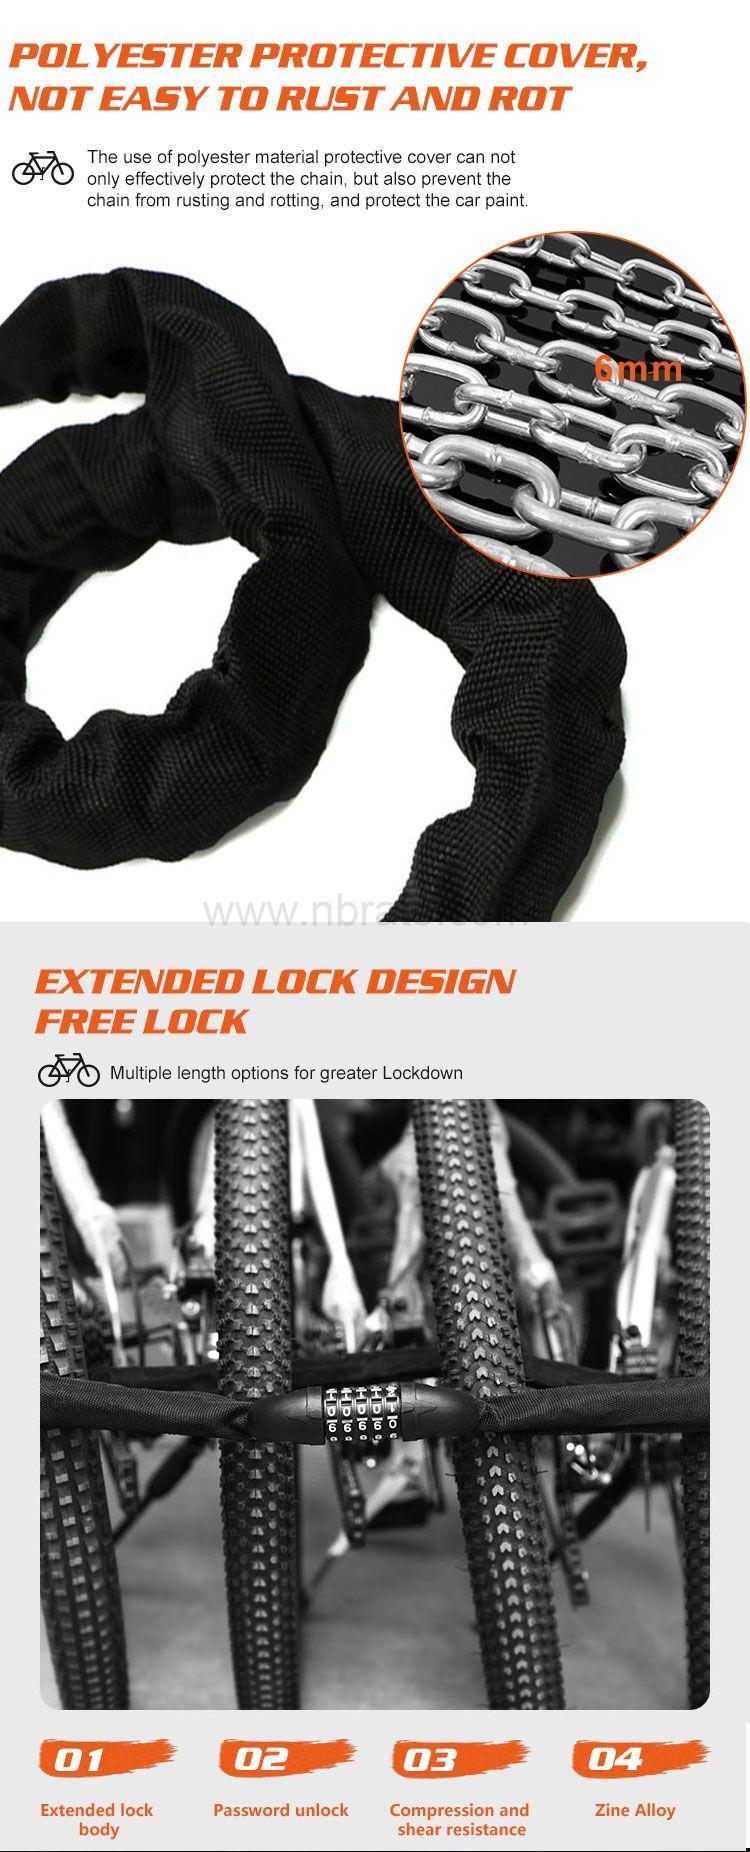 heavy duty anti theft password lock 5 digit bike chain lock